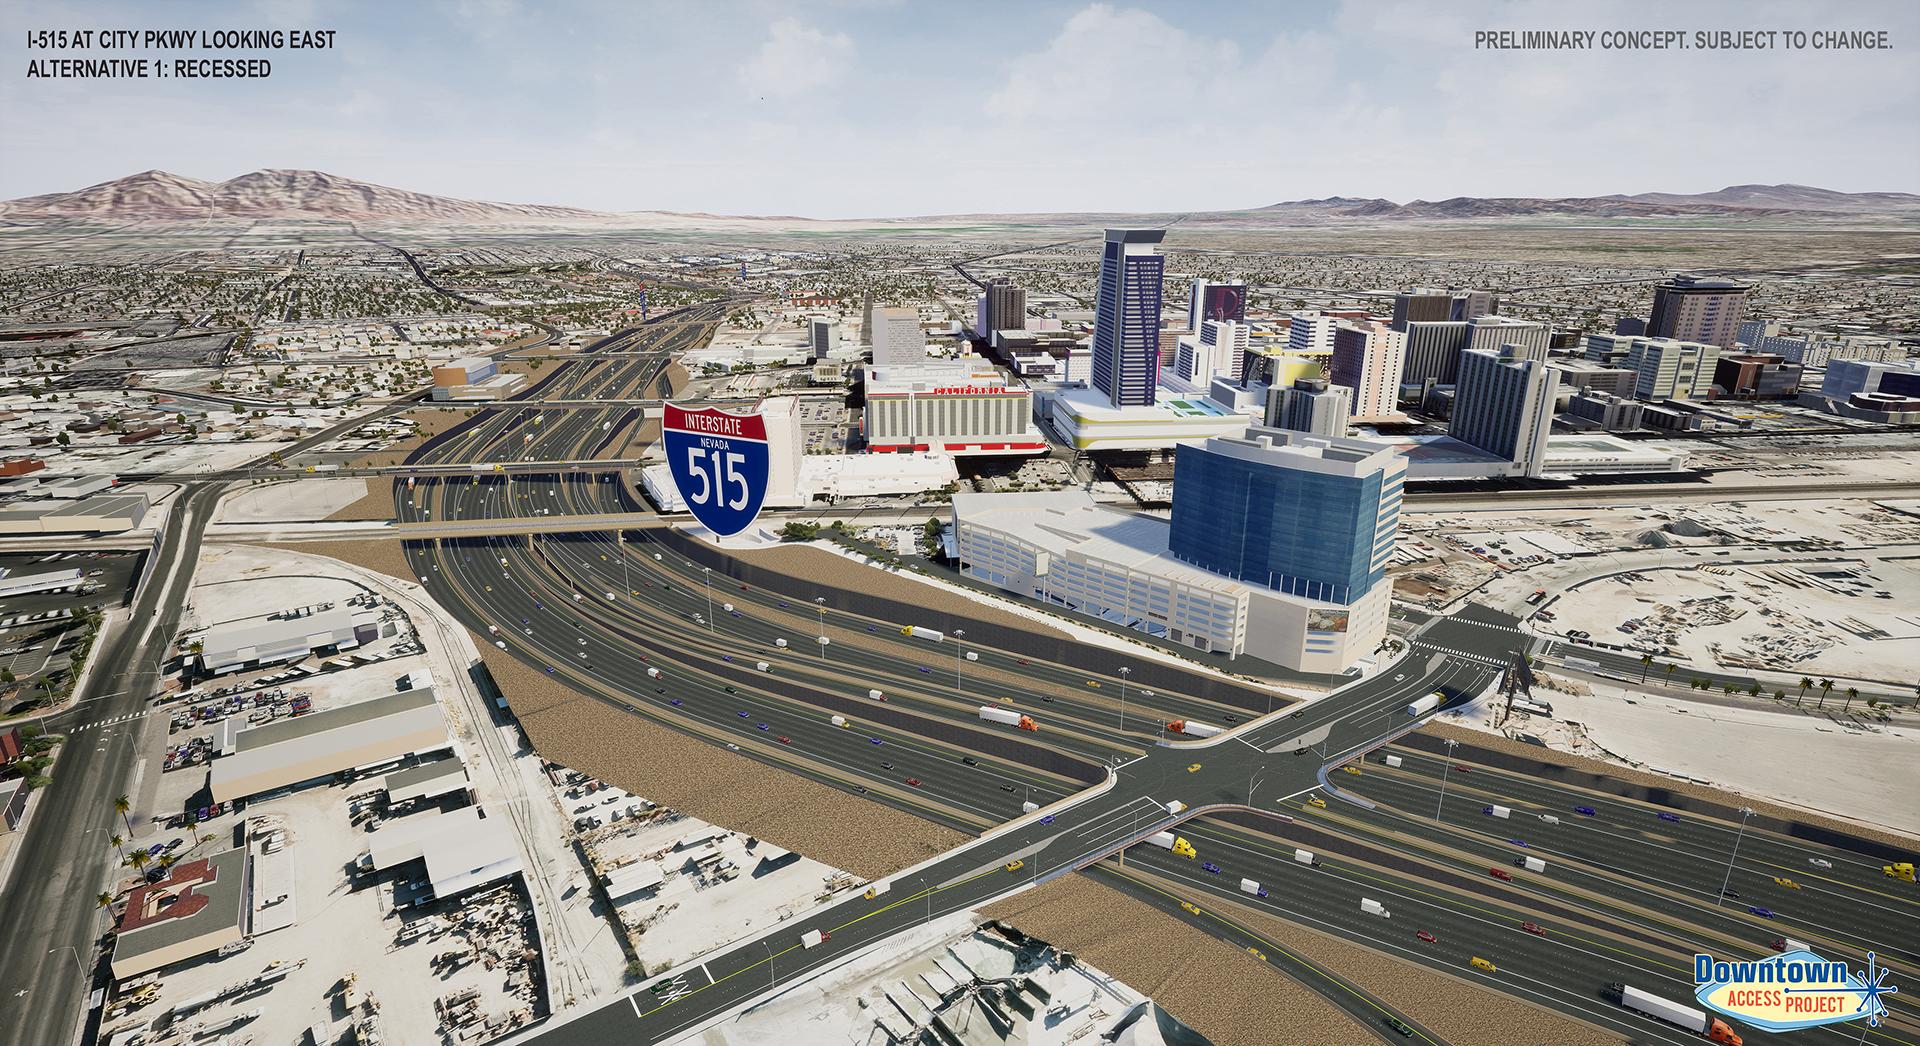 I-515 near city parkway alternative 1 rendering